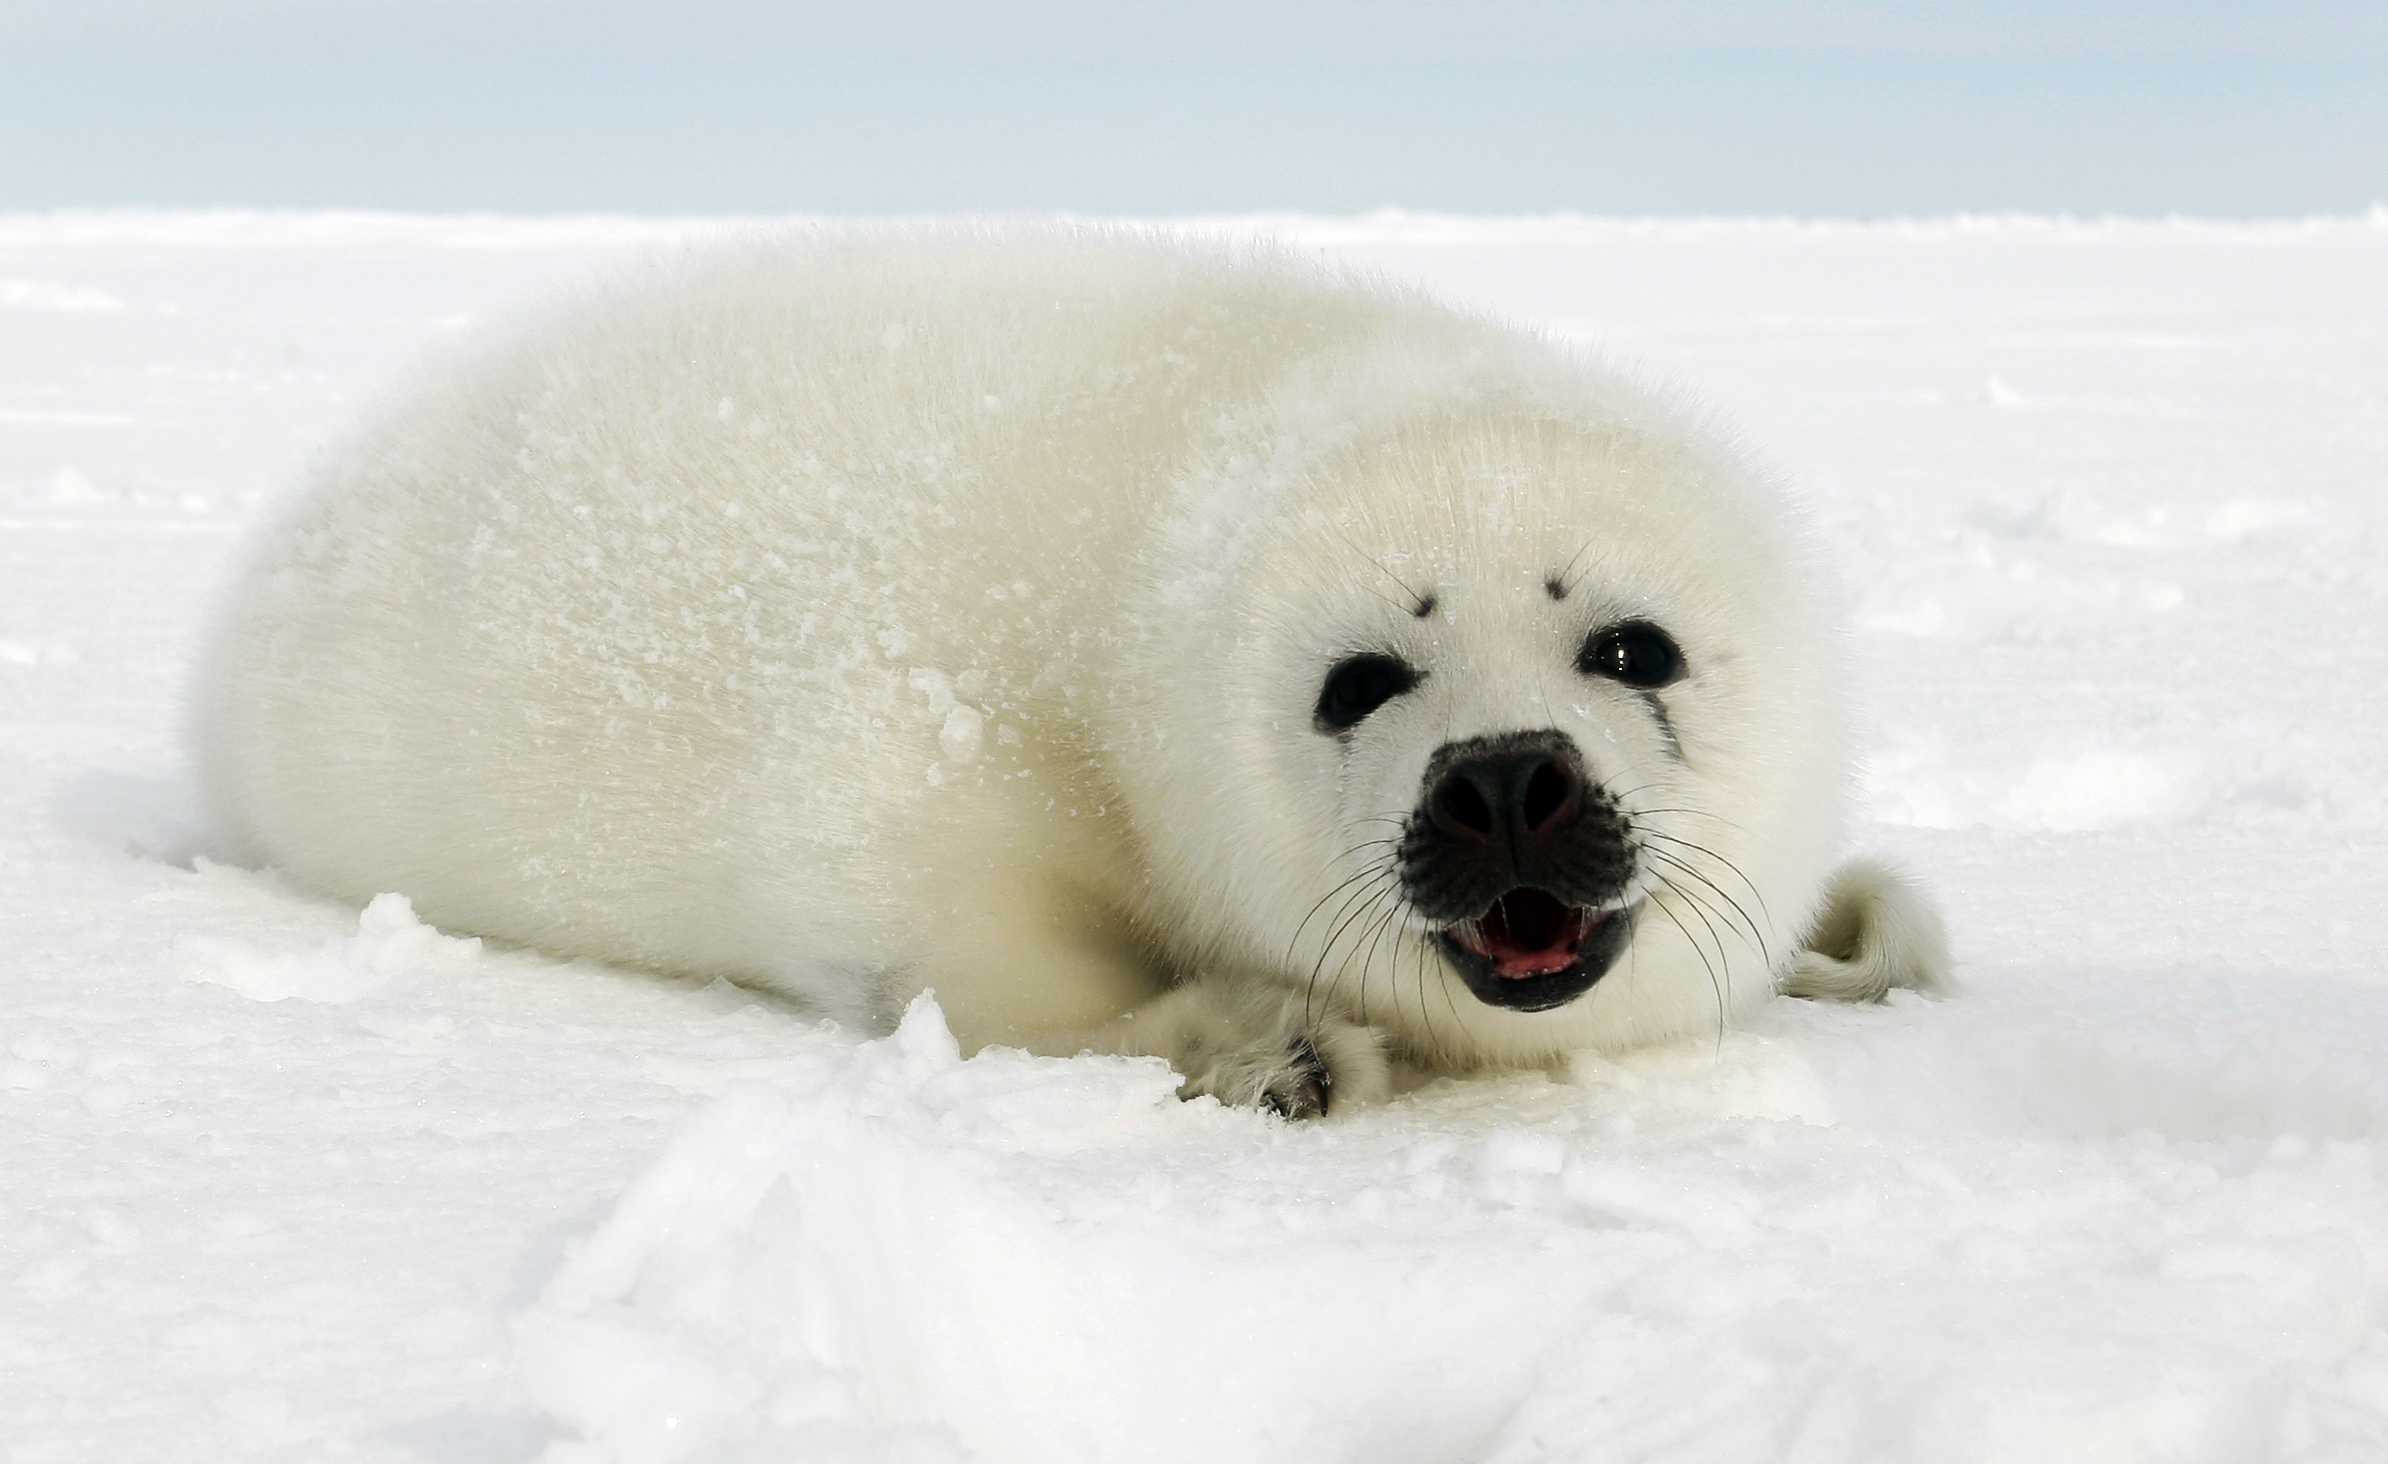 Newborn harp seal pup on ice floe in Canada